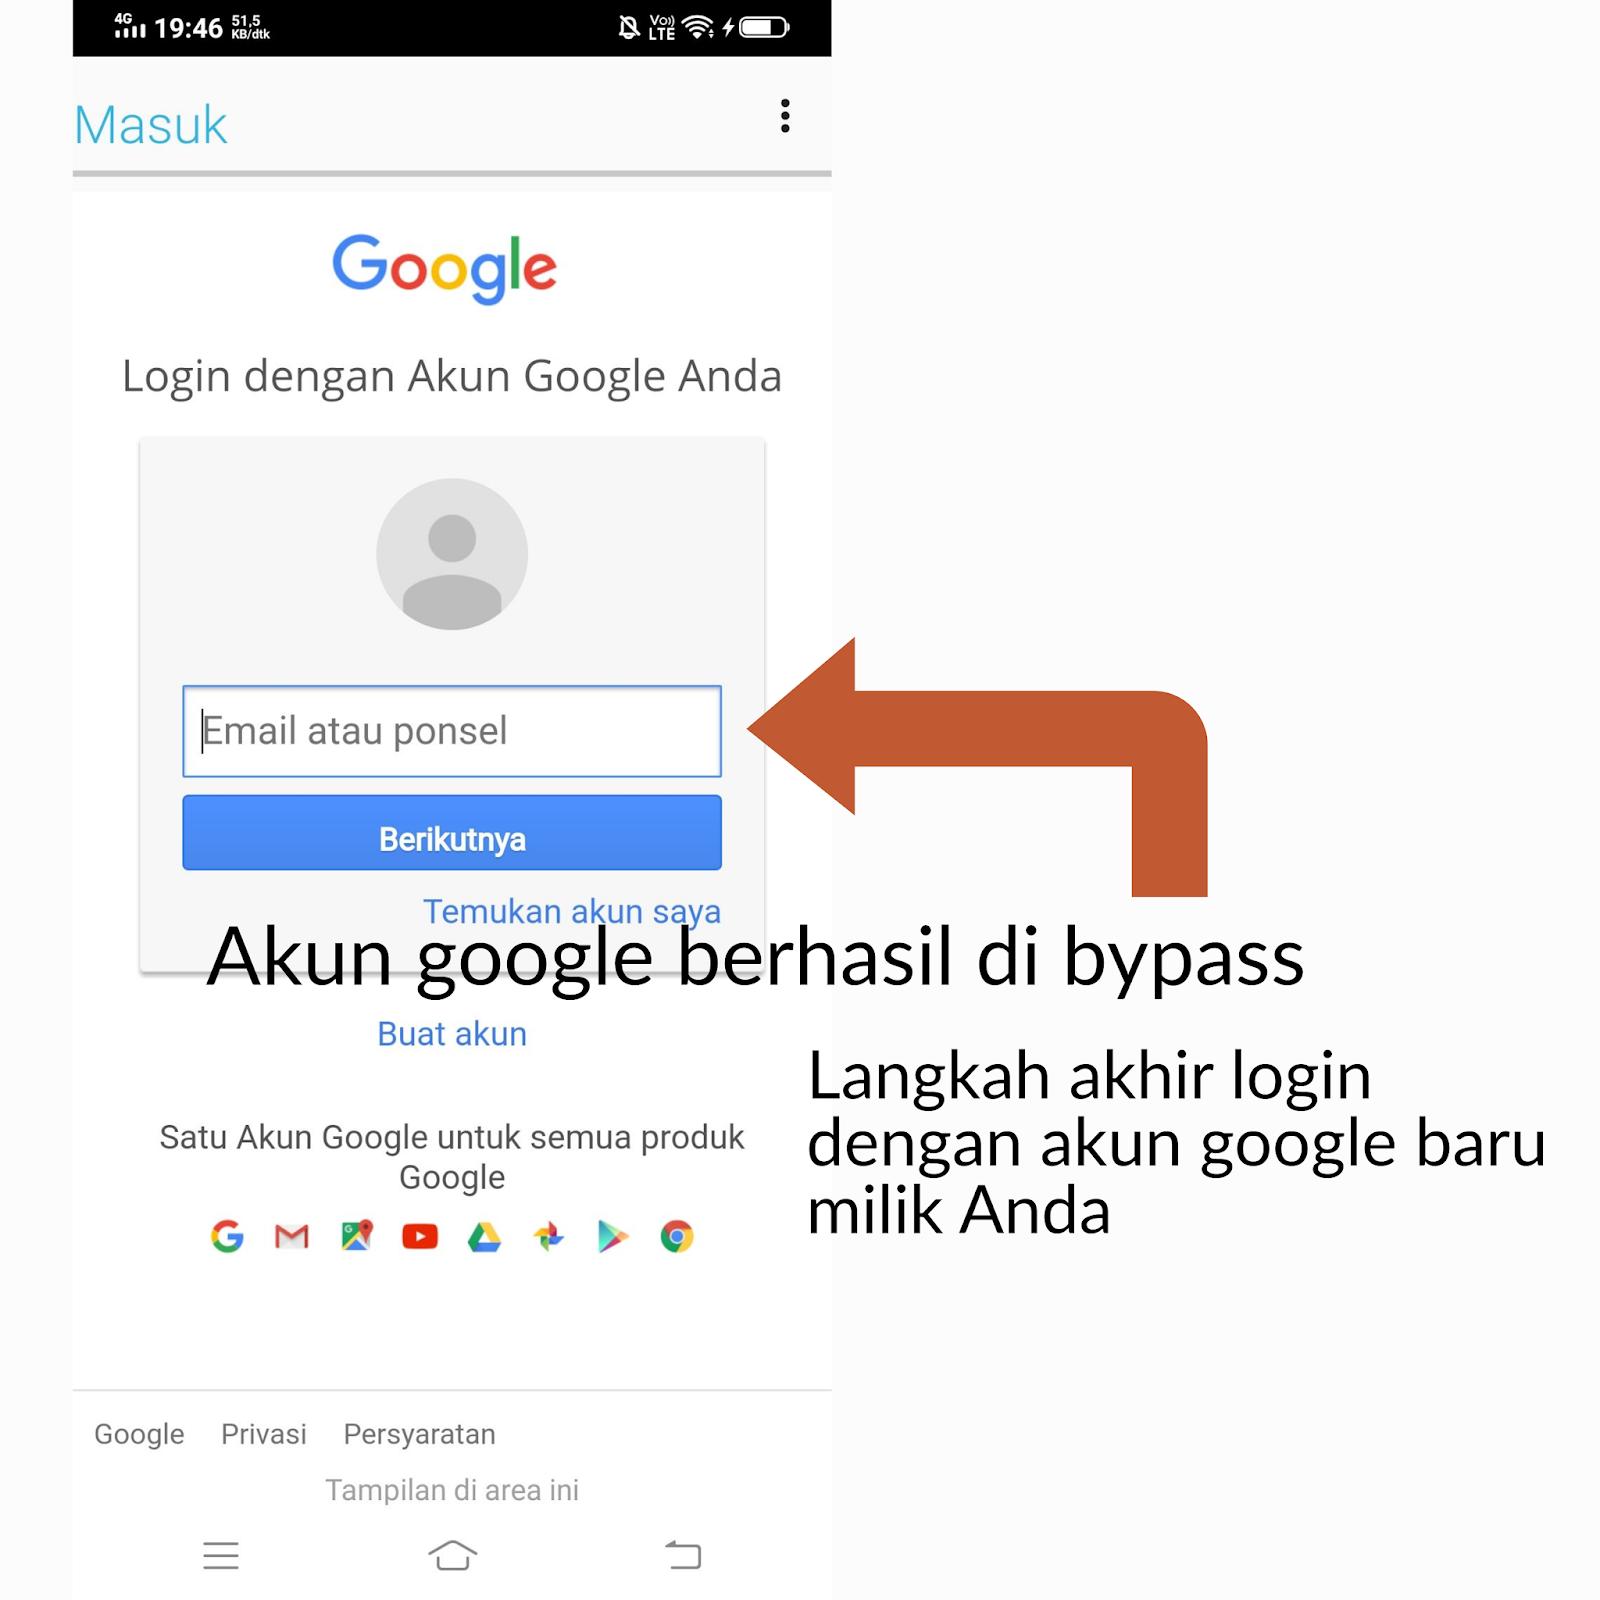 Cara Melewati Verifikasi Reset Pabrik Android Karena Lupa Password Akun Google Gmail 2020 Jelajah Android